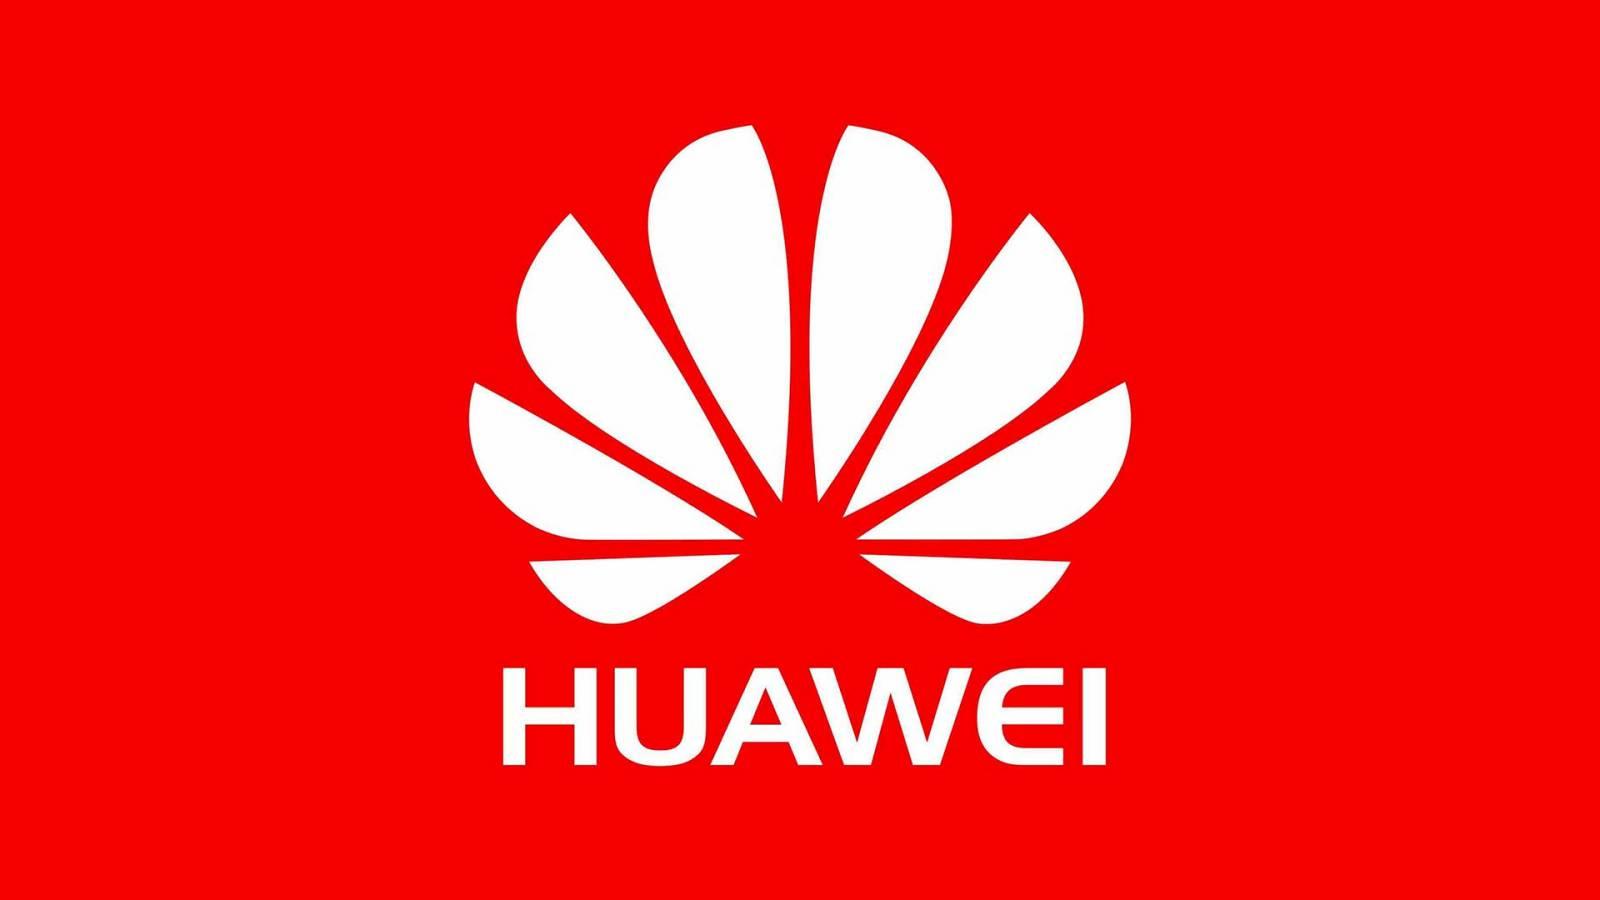 Huawei Windows 11